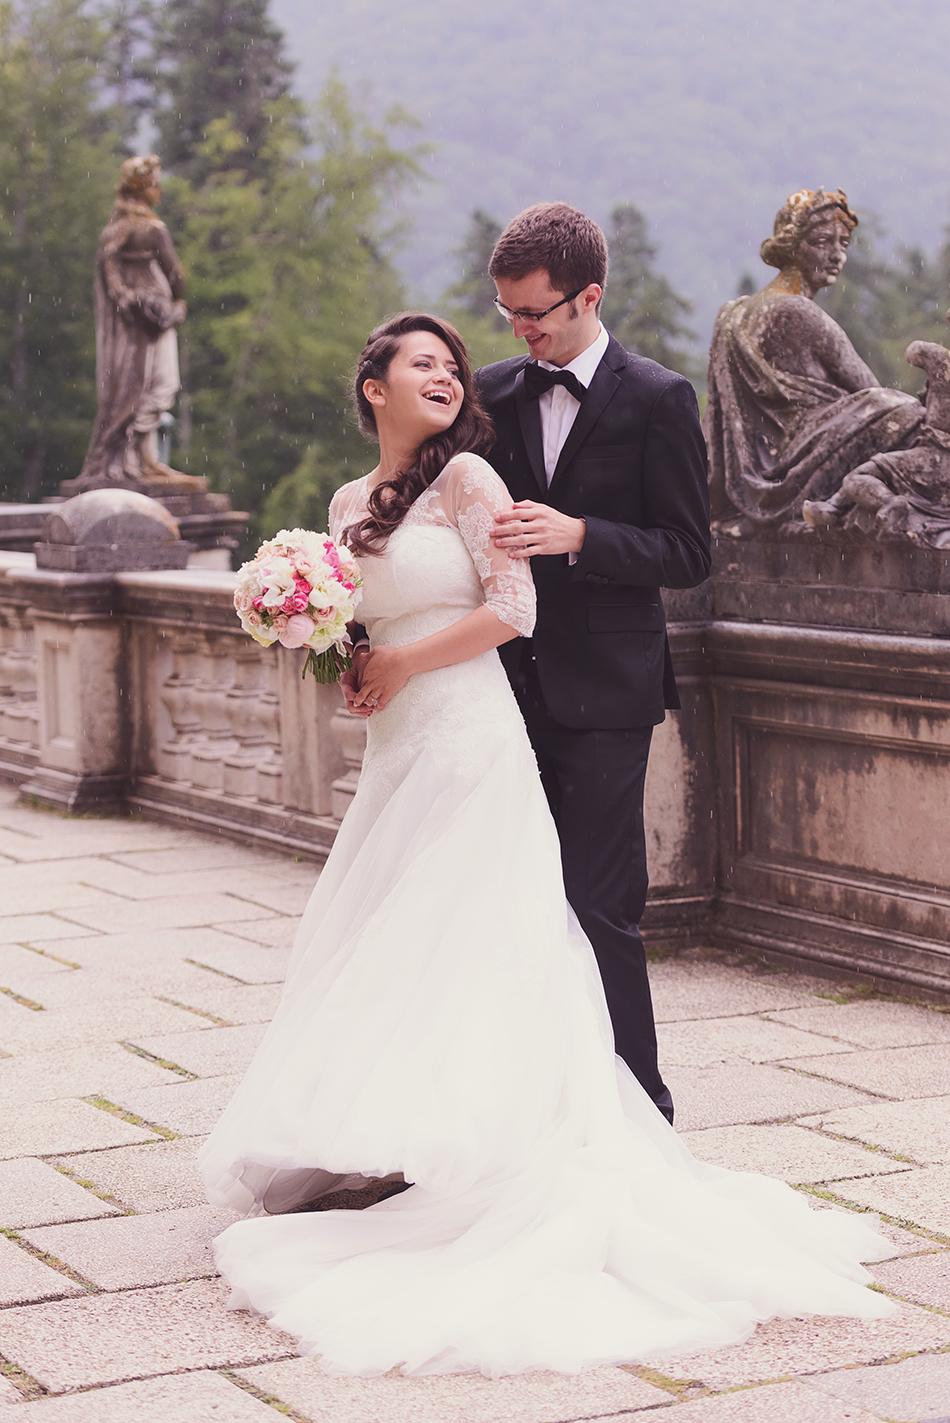 AD Passion Photography | fotograf-nunta-bucuresti_lorena-si-ammadeuss_0095 | Adelin, Dida, fotograf profesionist, fotograf de nunta, fotografie de nunta, fotograf Timisoara, fotograf Craiova, fotograf Bucuresti, fotograf Arad, nunta Timisoara, nunta Arad, nunta Bucuresti, nunta Craiova